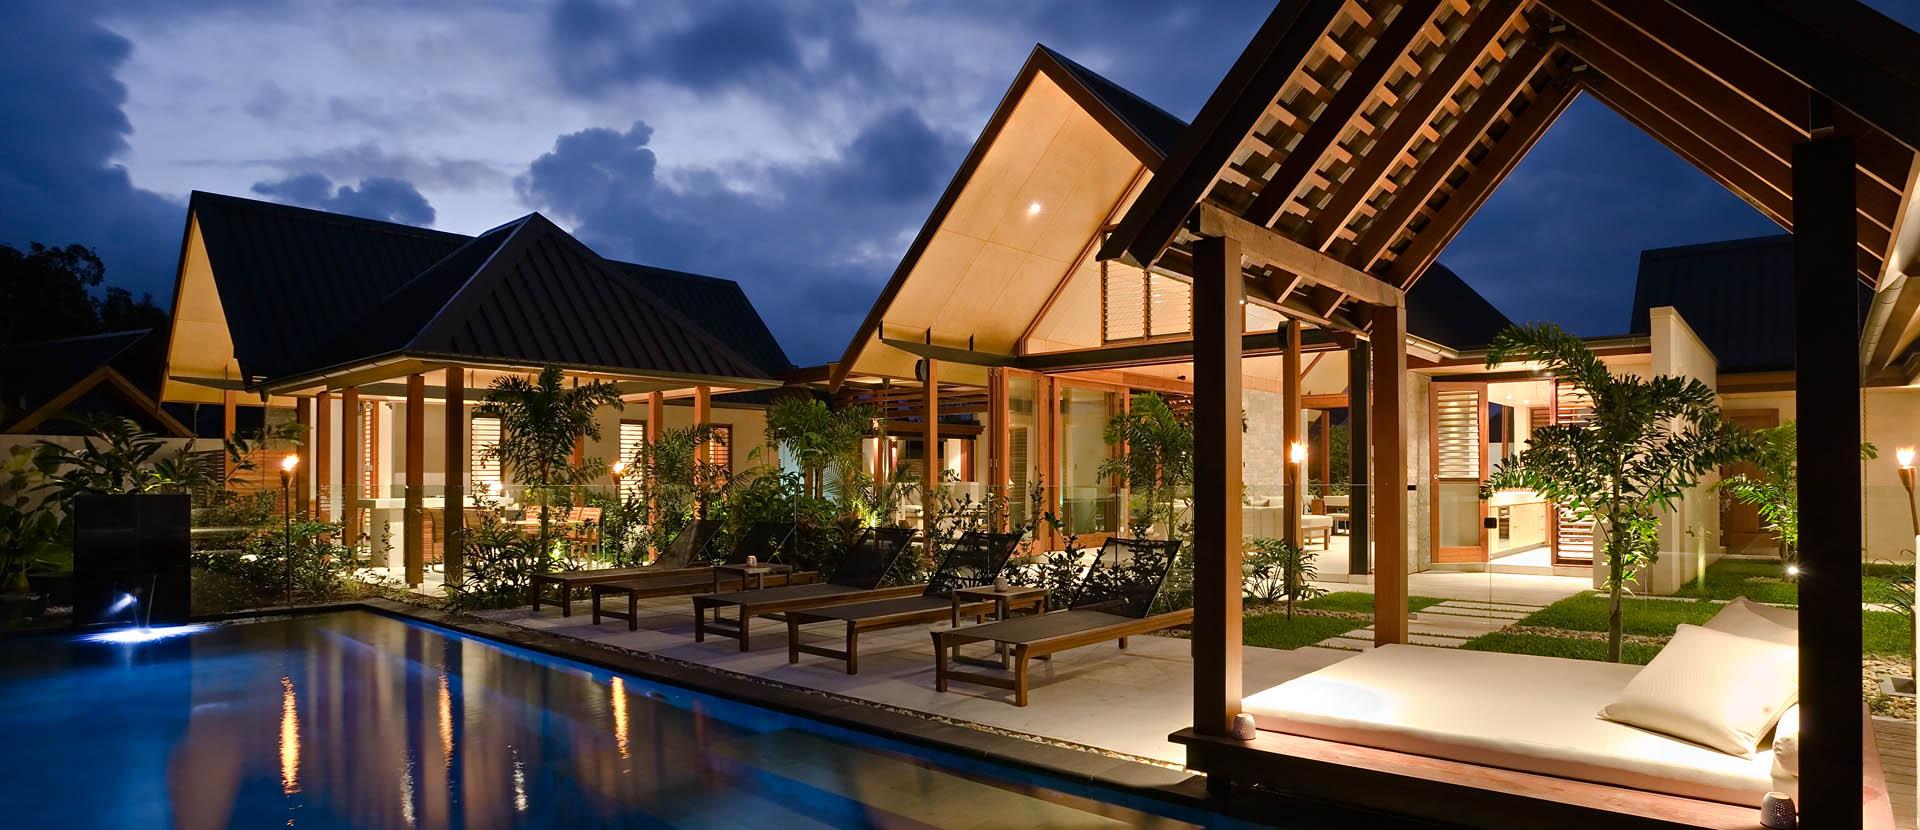 Niramaya villas spa aaa rated 5 star accredited for 5 star villas